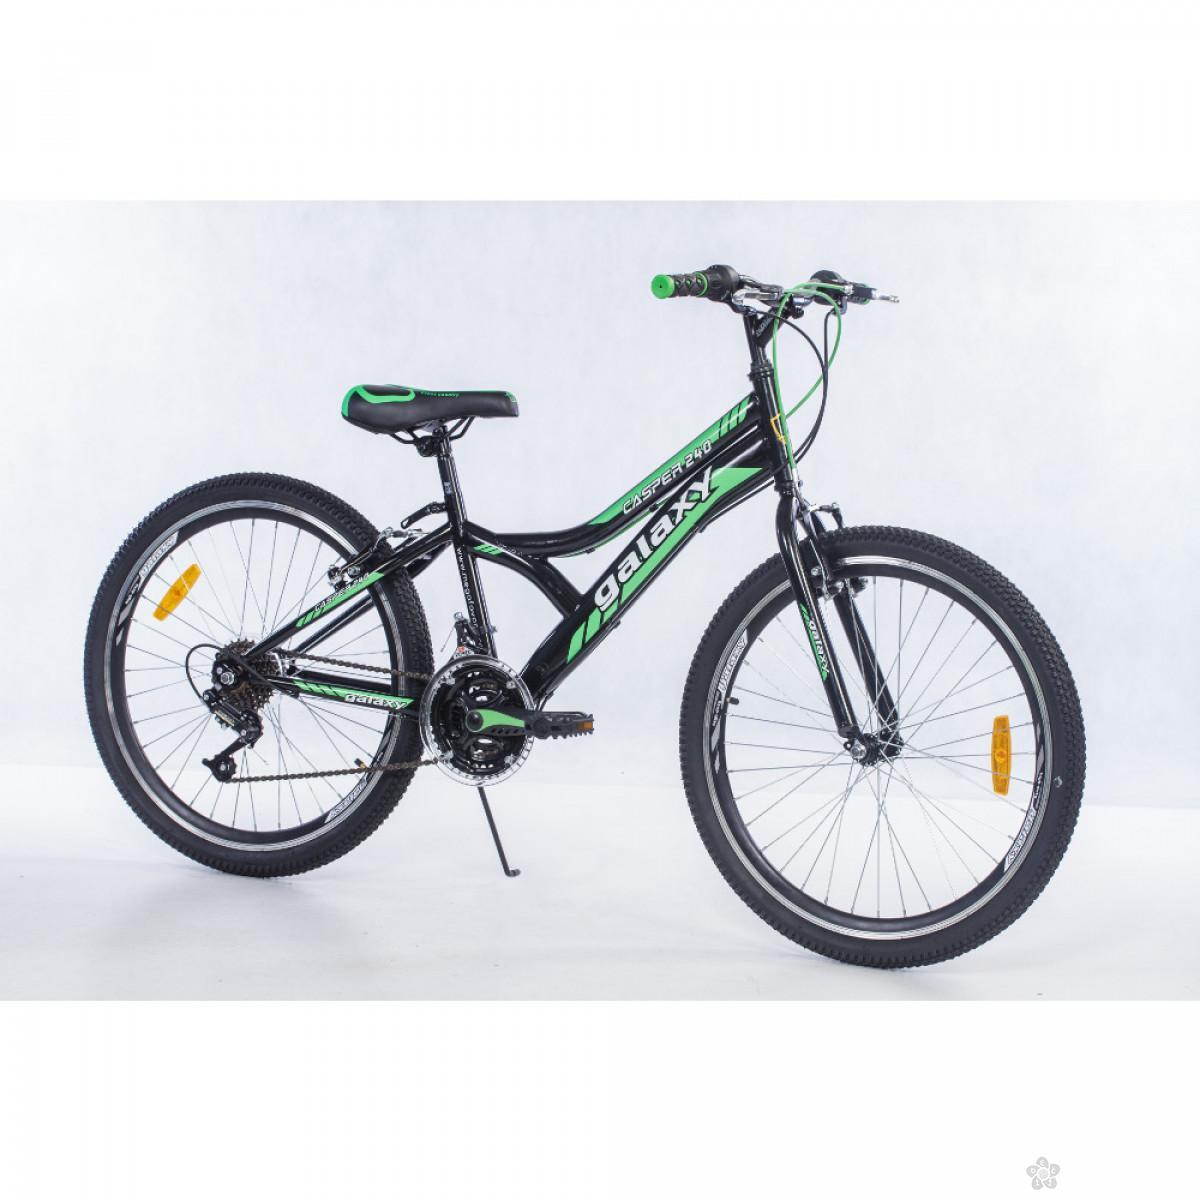 Dečiji Bicikl Casper 240 24/18 crna/zelena, 650082